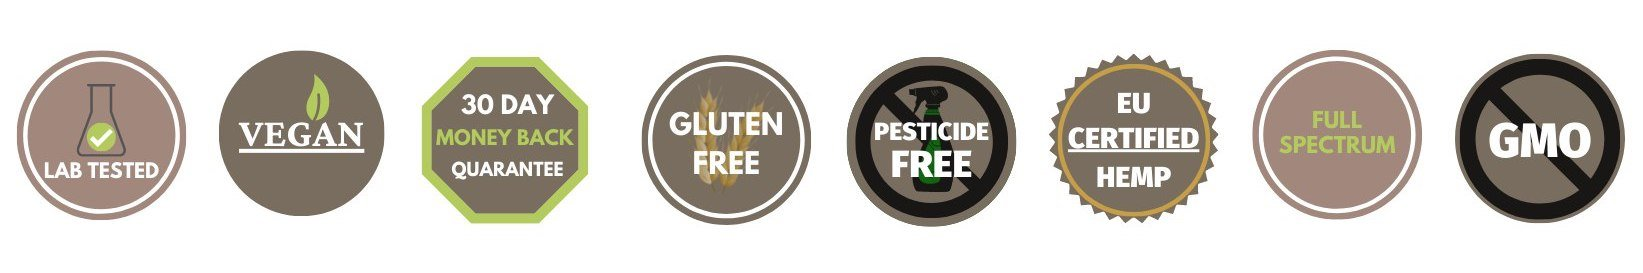 Lab tested_Vegan_30 DAY money back quarantee_gluten free_Pesticide Free_EU certigfied hemp_Full Spectrum:non gmo